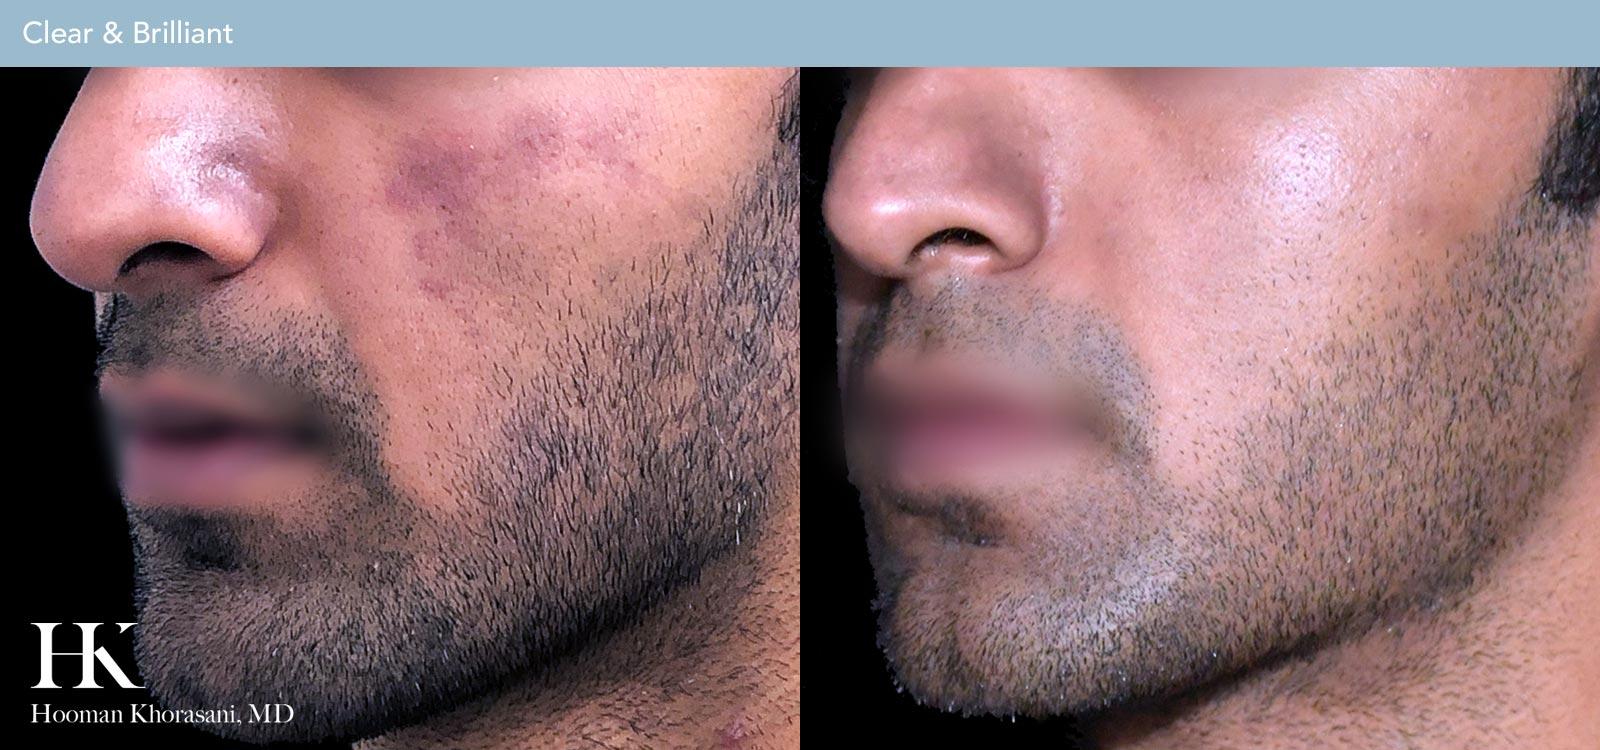 Visit our Laser Skin Resurfacing Gallery